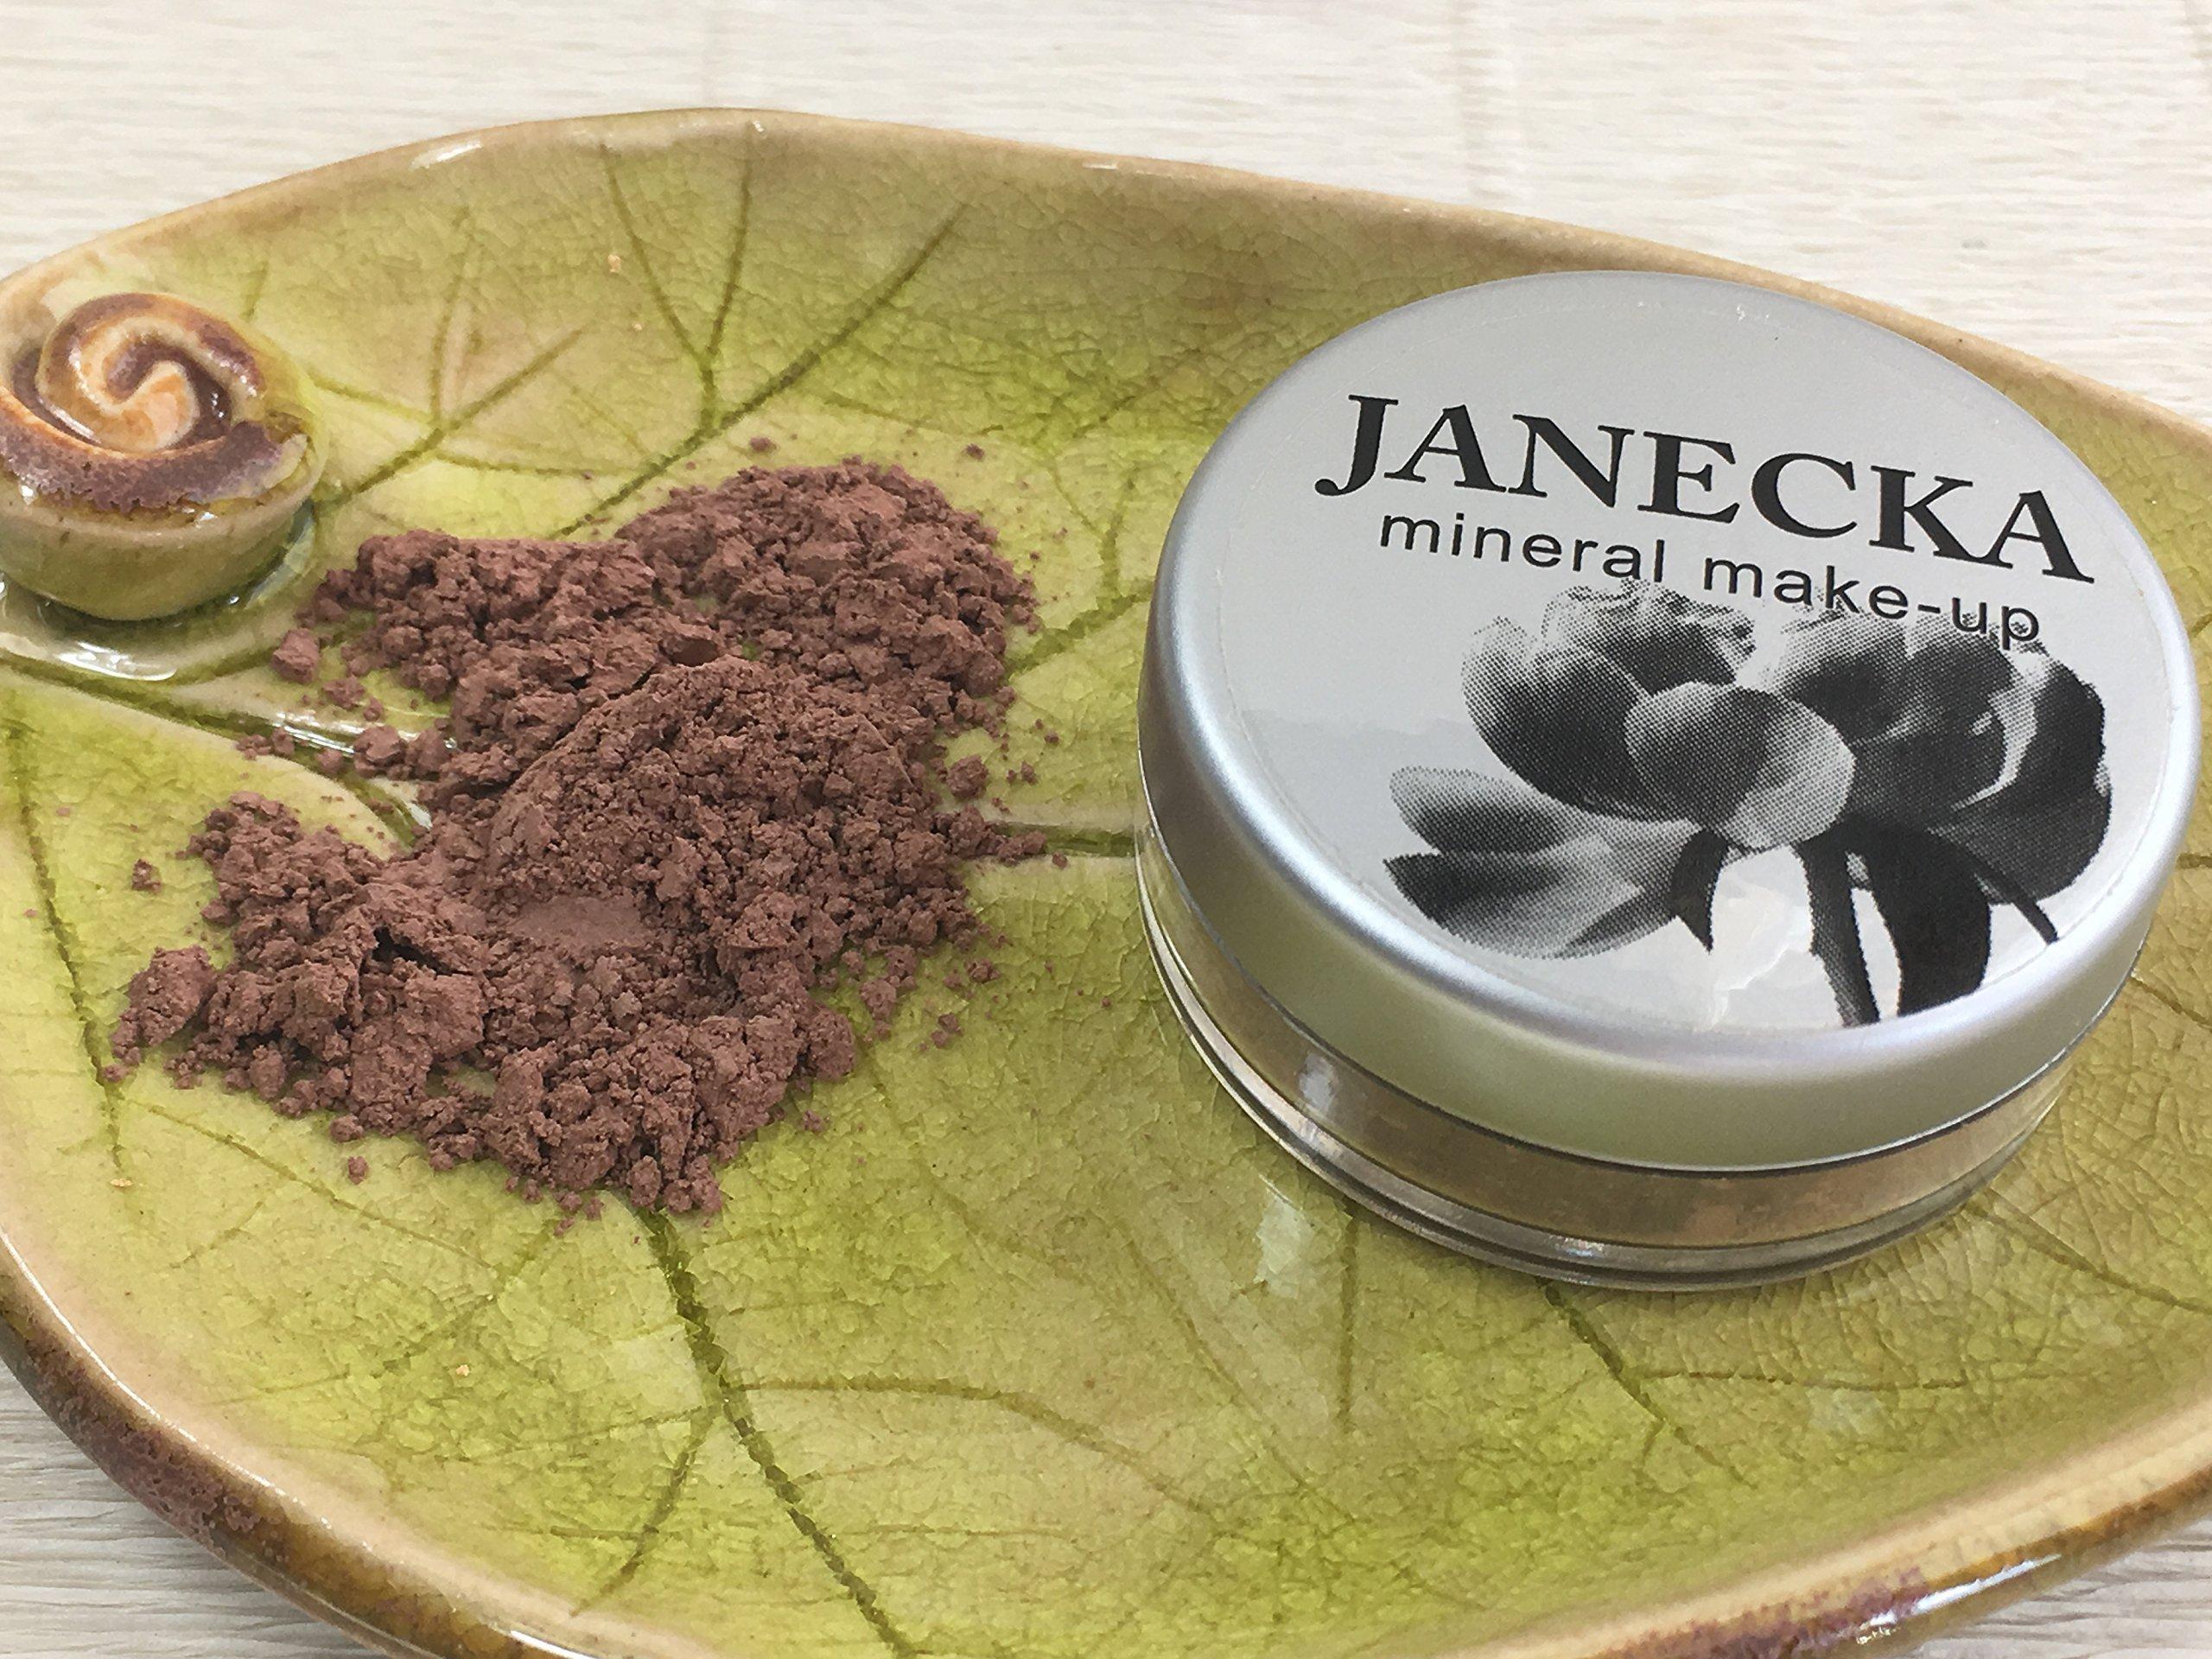 JANECKA Mineral Blush - Pietersite - Handcrafted Make Up by B JANECKA